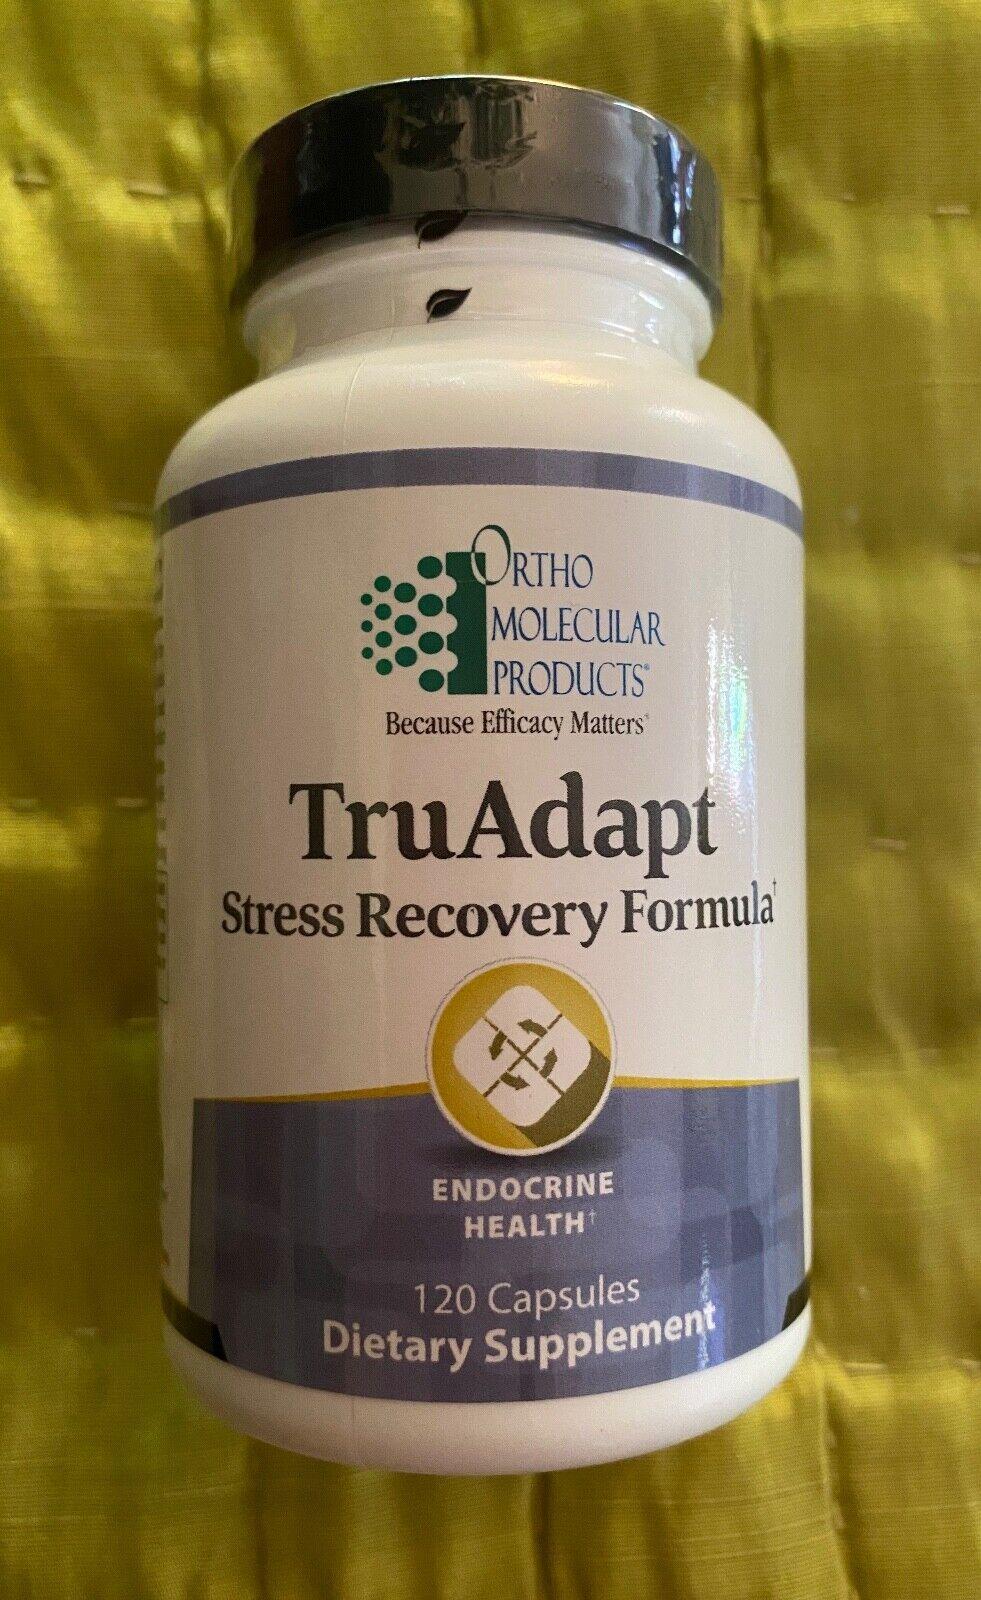 Ortho Molecular TruAdapt Stress Recovery Formula 120 Capsules